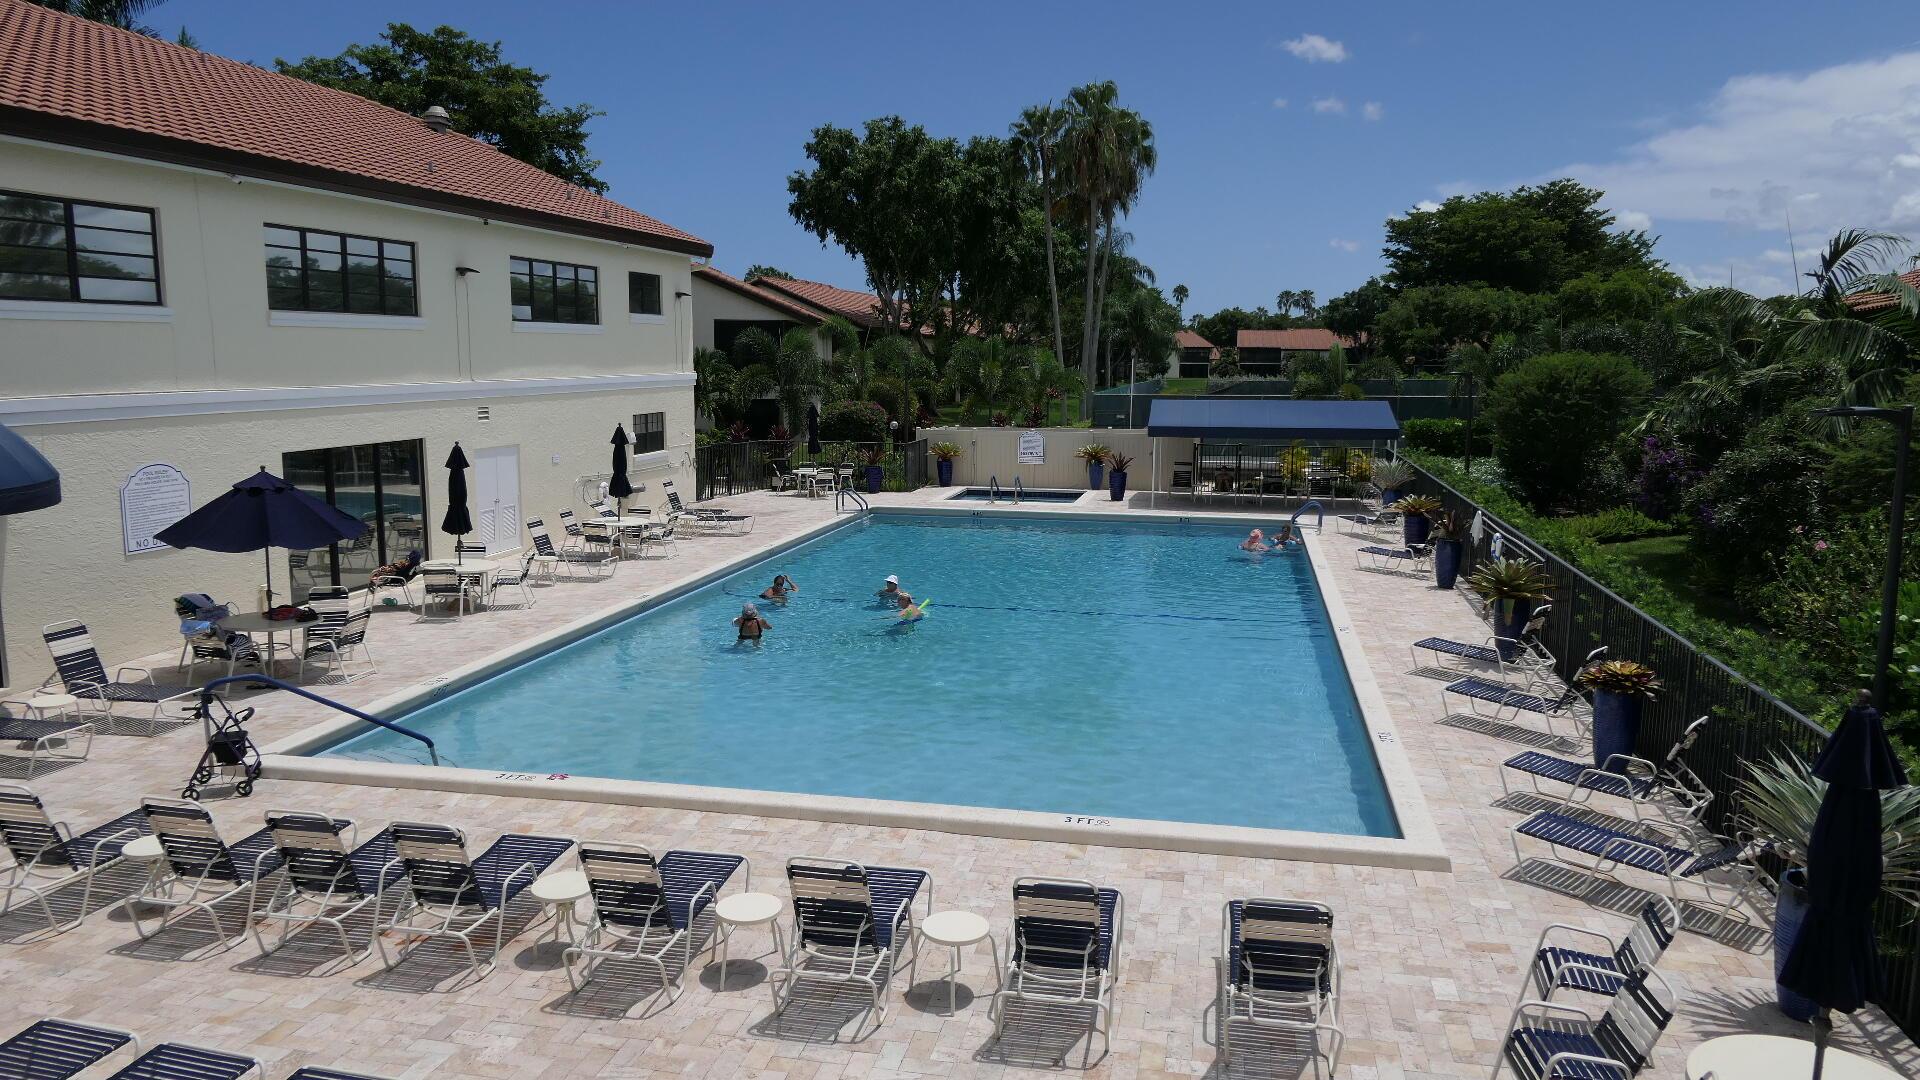 10804 Bahama Palm Way 101 Boynton Beach, FL 33437 photo 72